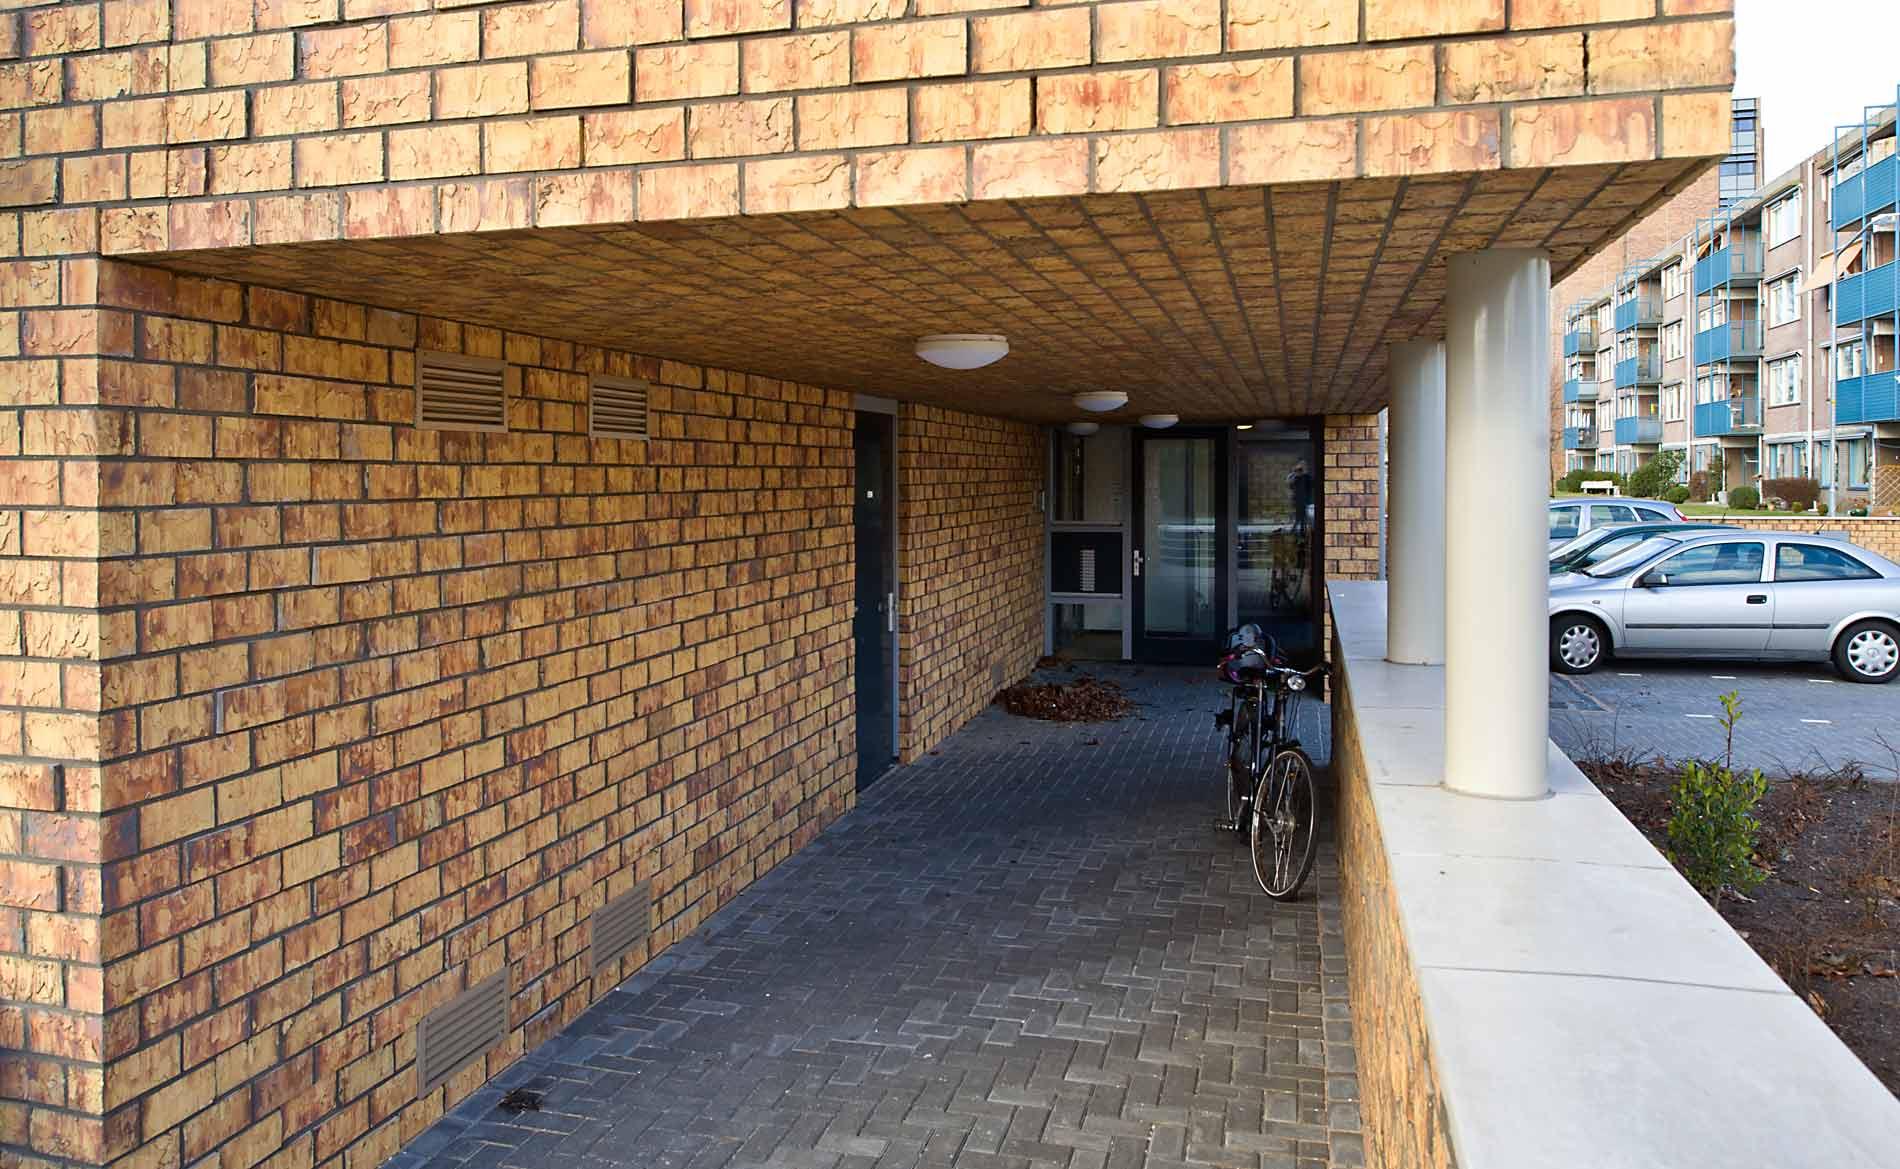 Brugwoningen appartementen ouderenhuisvesting modern urban villa Heemskerk BBHD architecten WoonopMaat